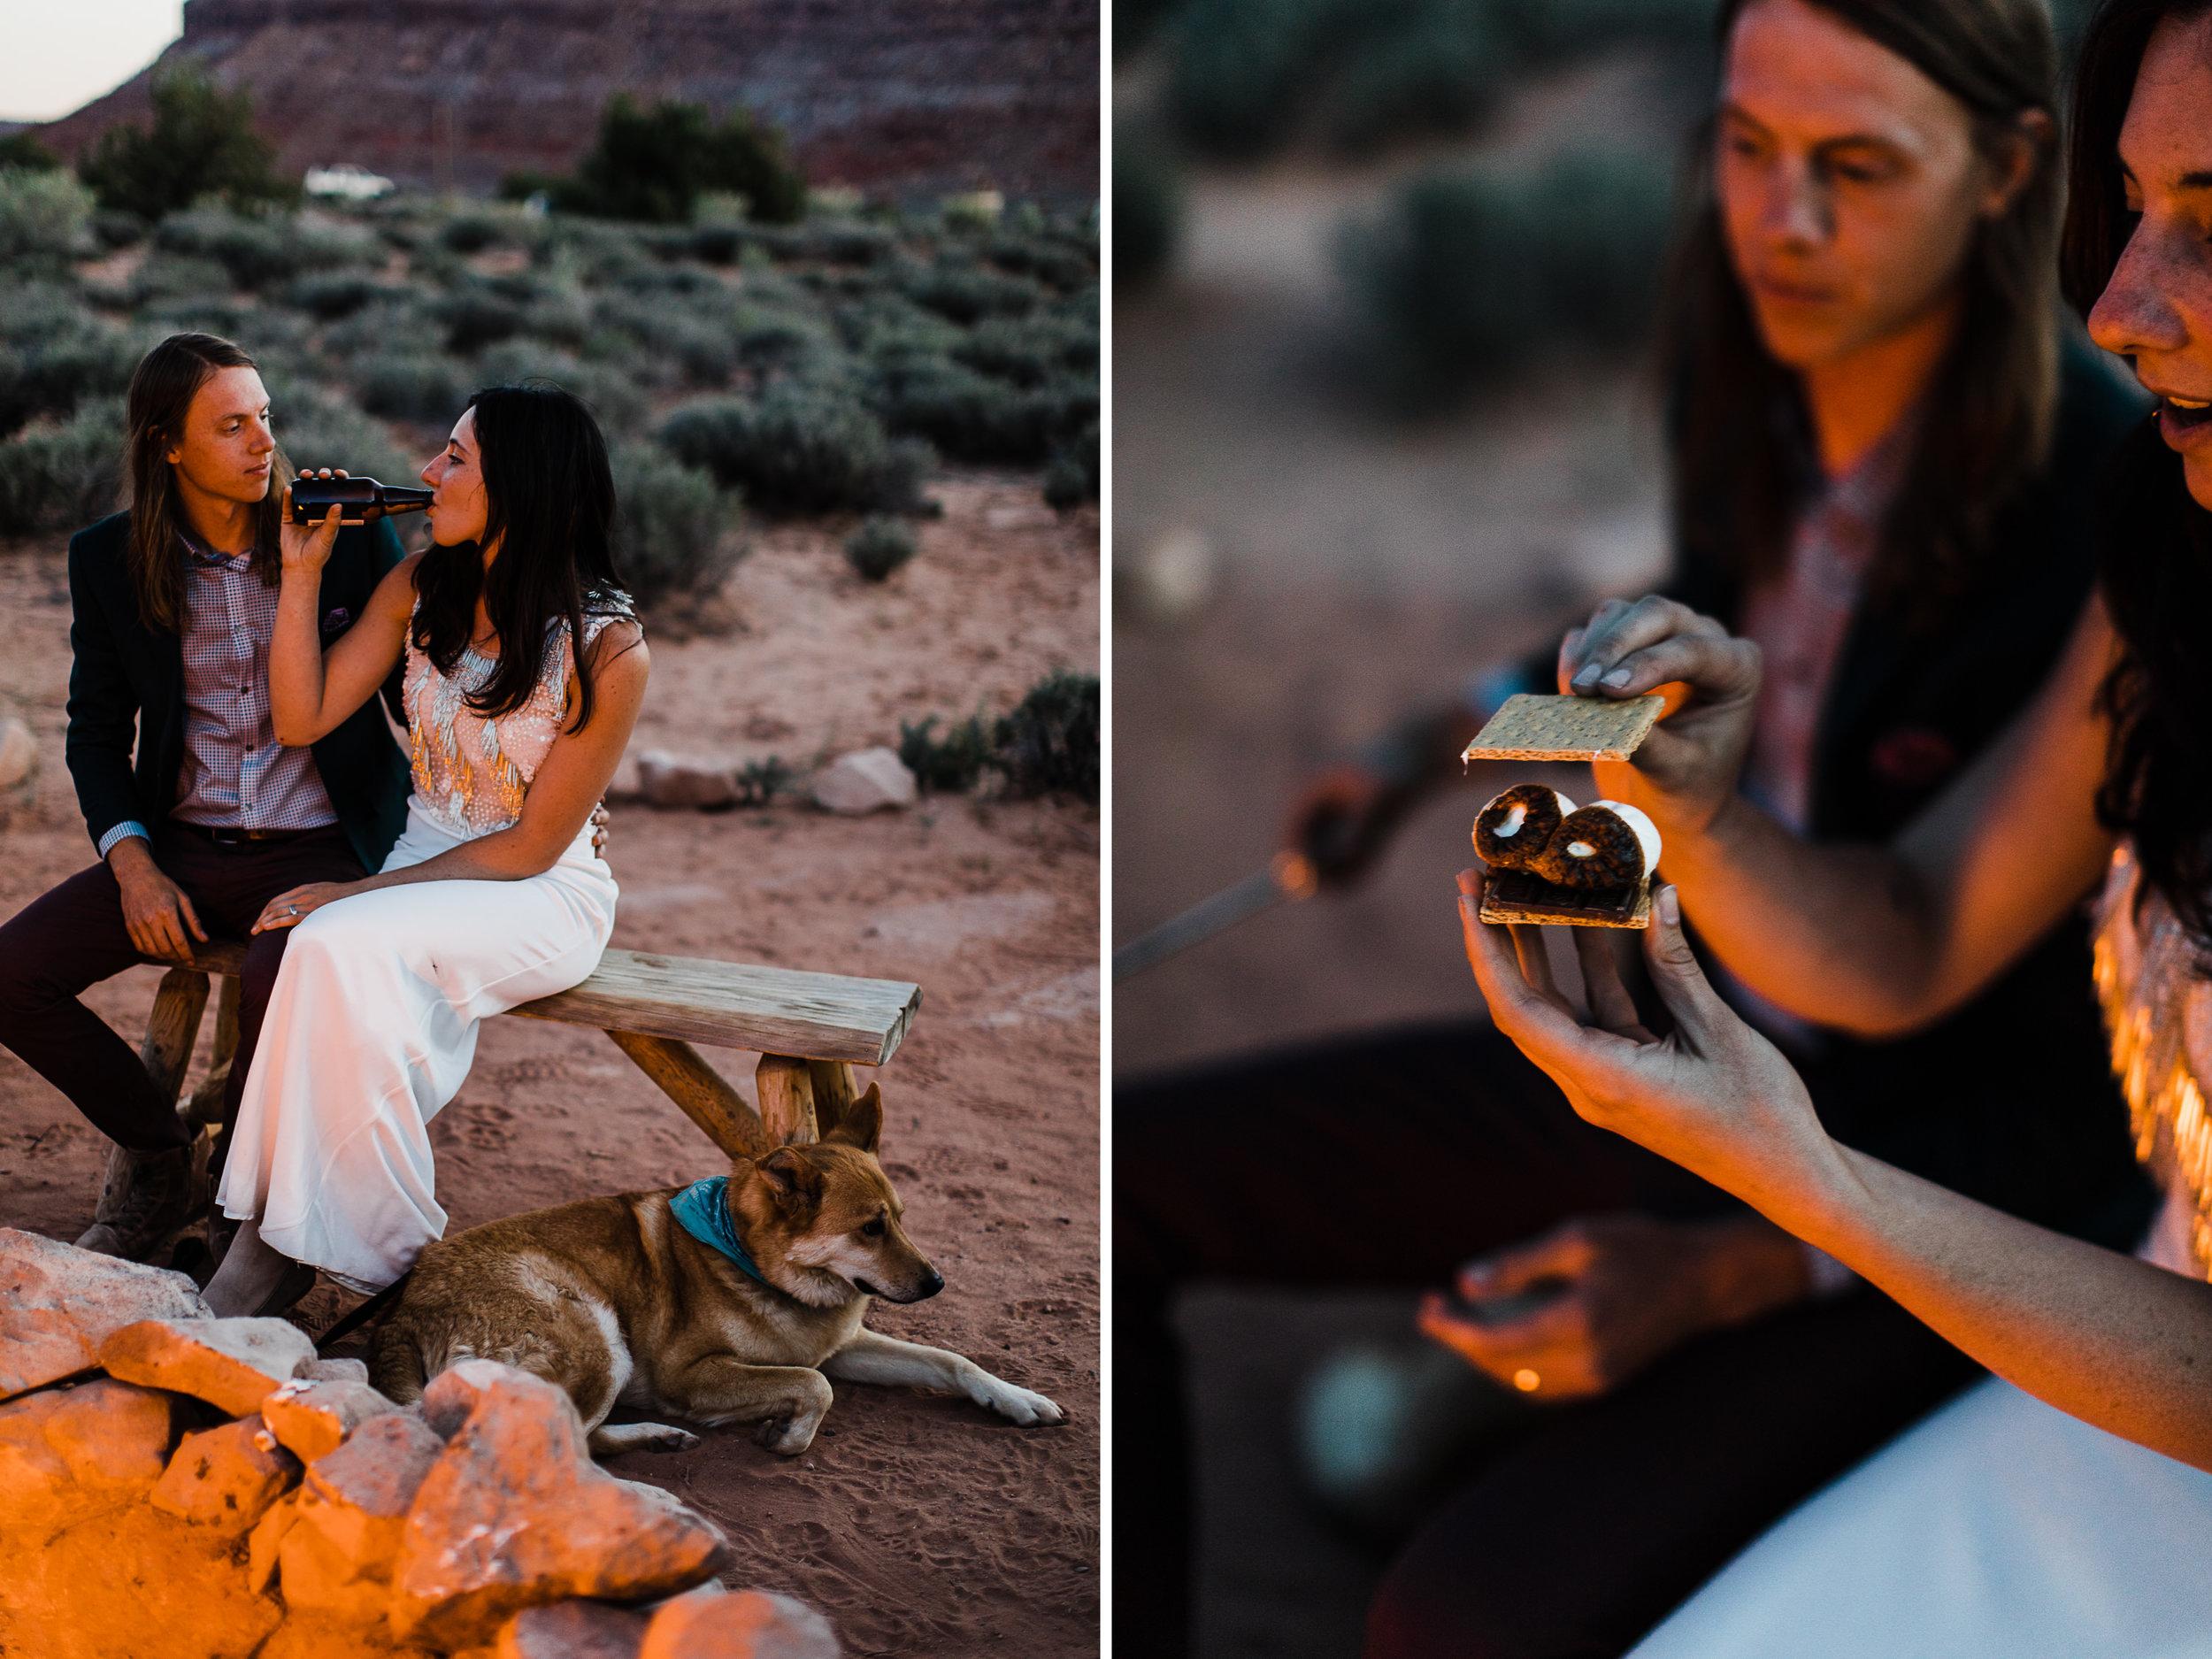 canyonlands national park elopement at moab under canvas | destination adventure wedding photographers | the hearnes adventure photography | www.thehearnes.com